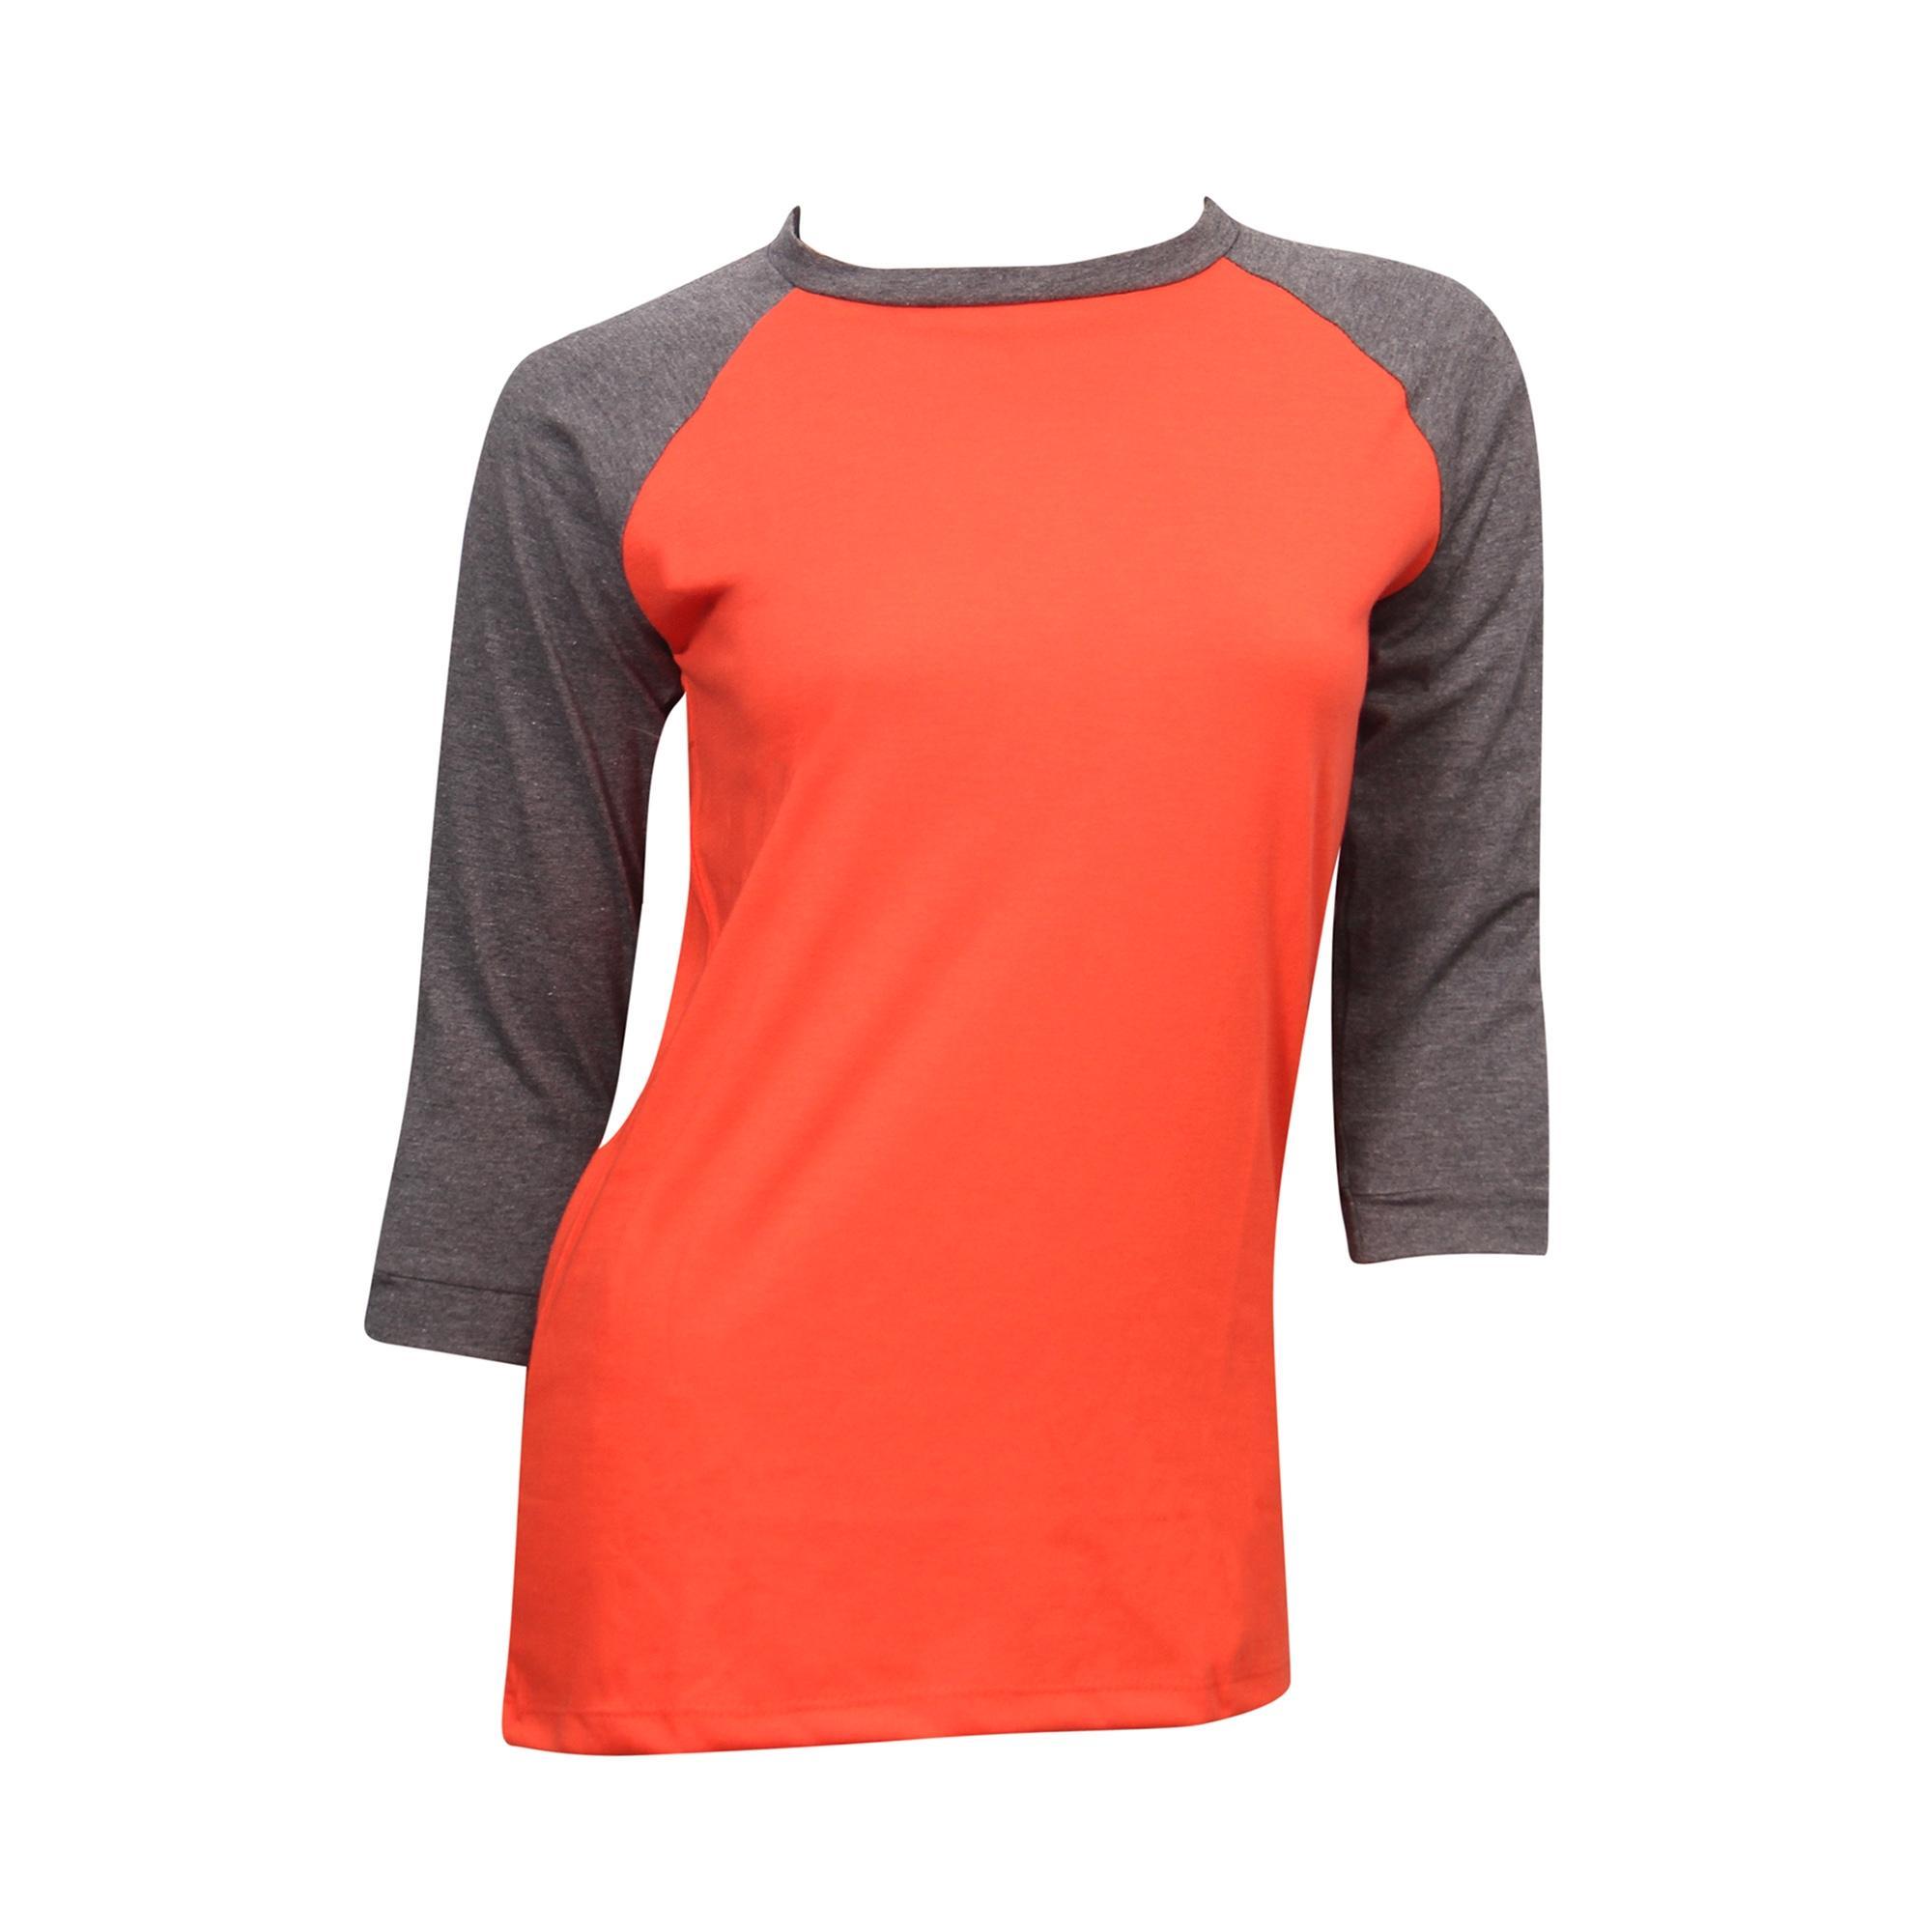 Women's Grey Mix Orange T-Shirt